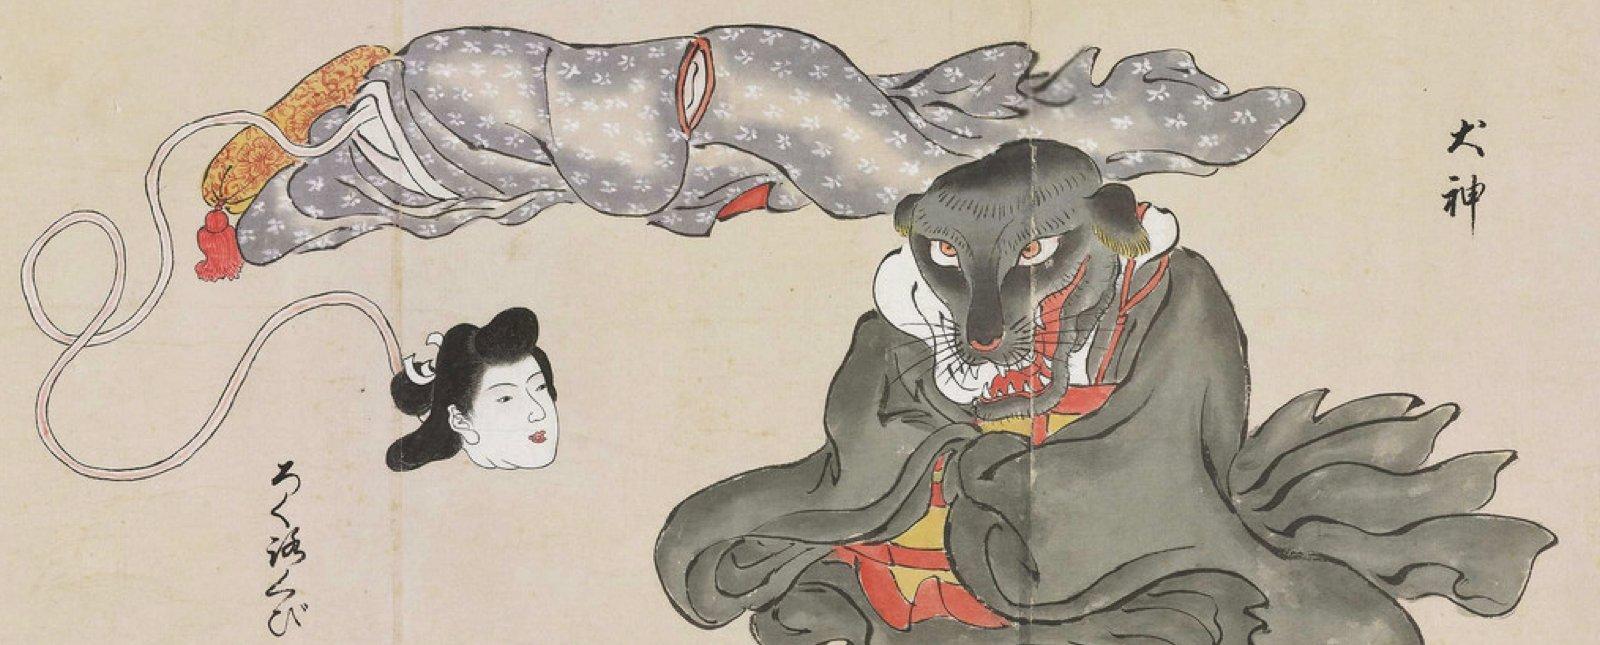 Inugami – a curse, a ritual, a demon